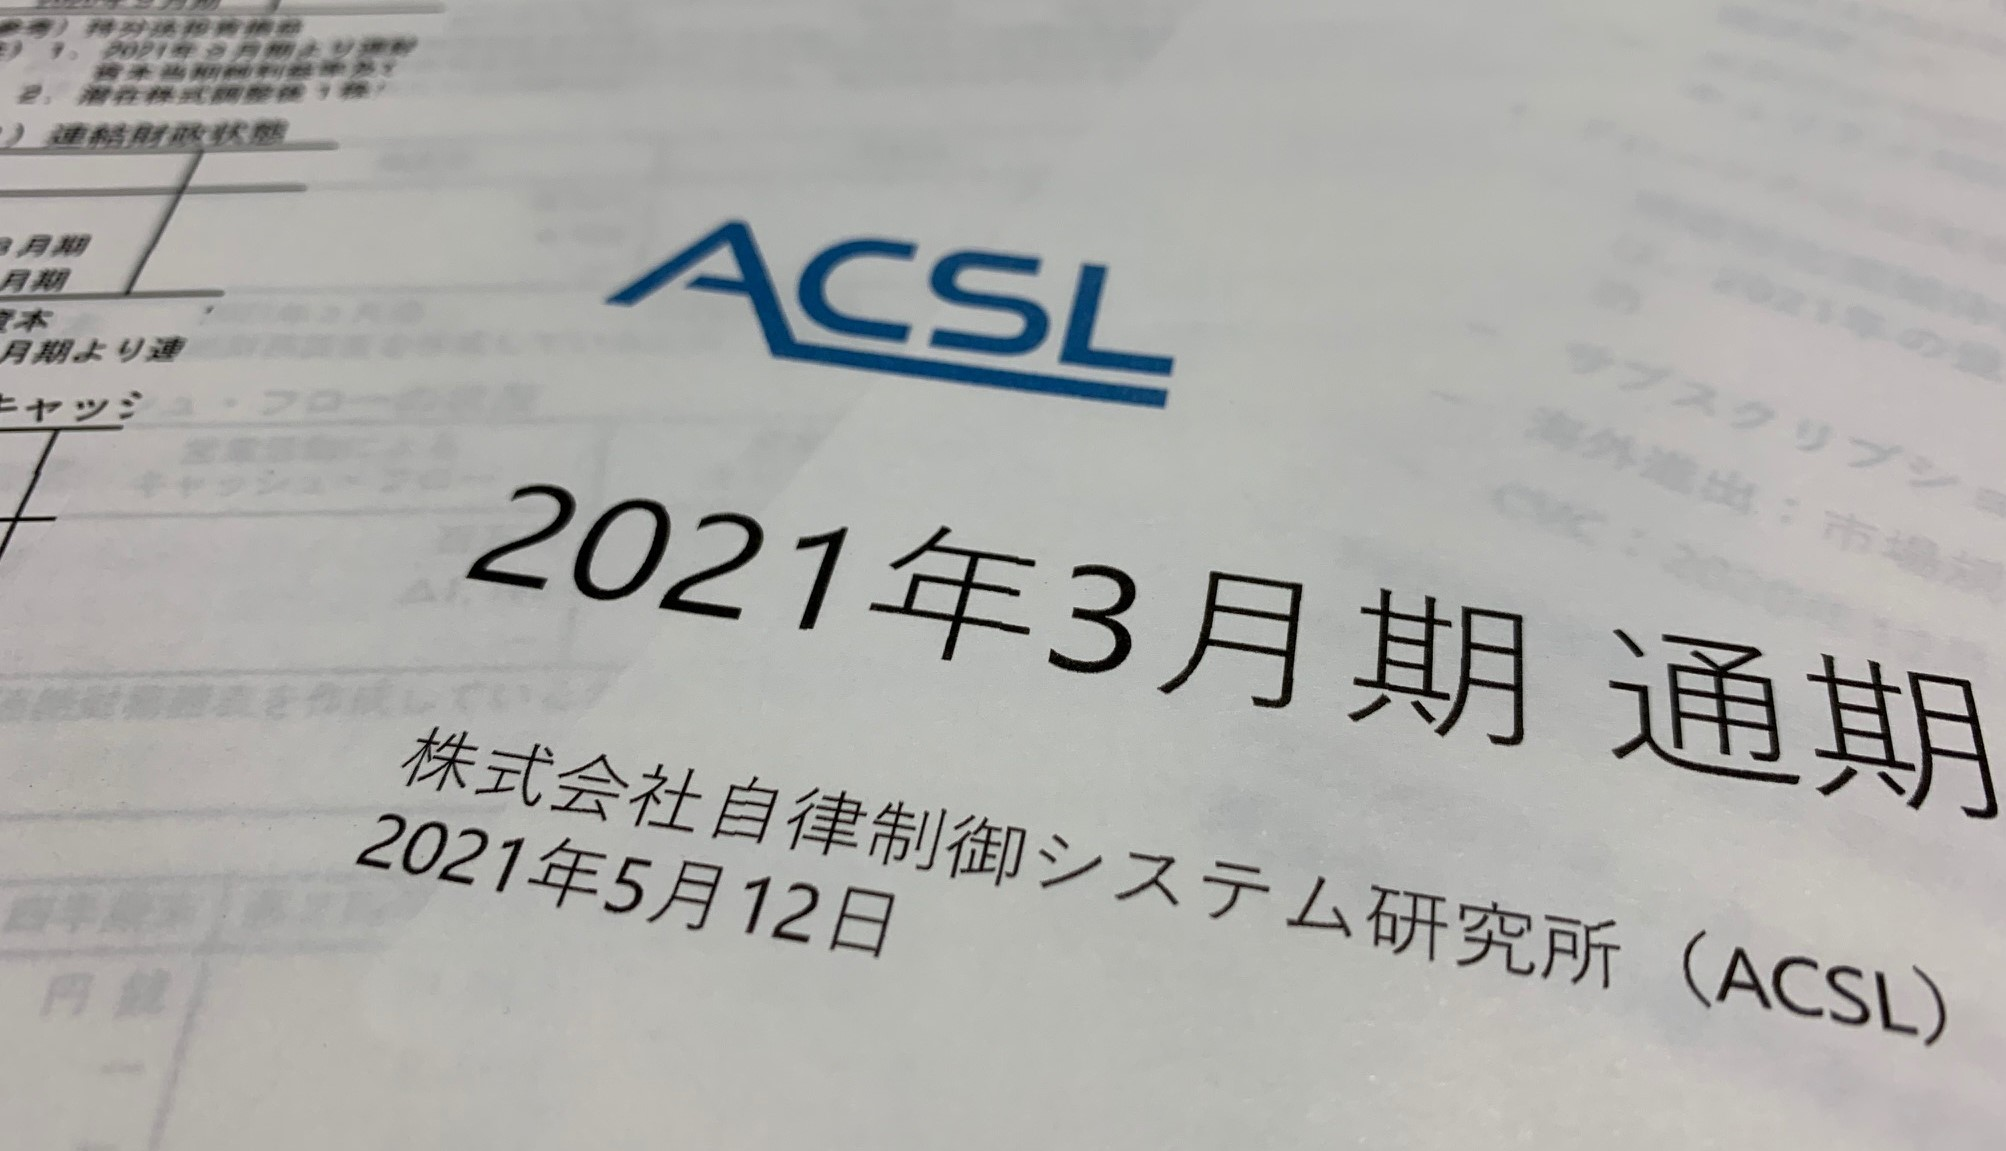 ACSLが15億円の最終赤字発表 太田氏の代表CEO退任を内定、代表は鷲谷氏1人体制に